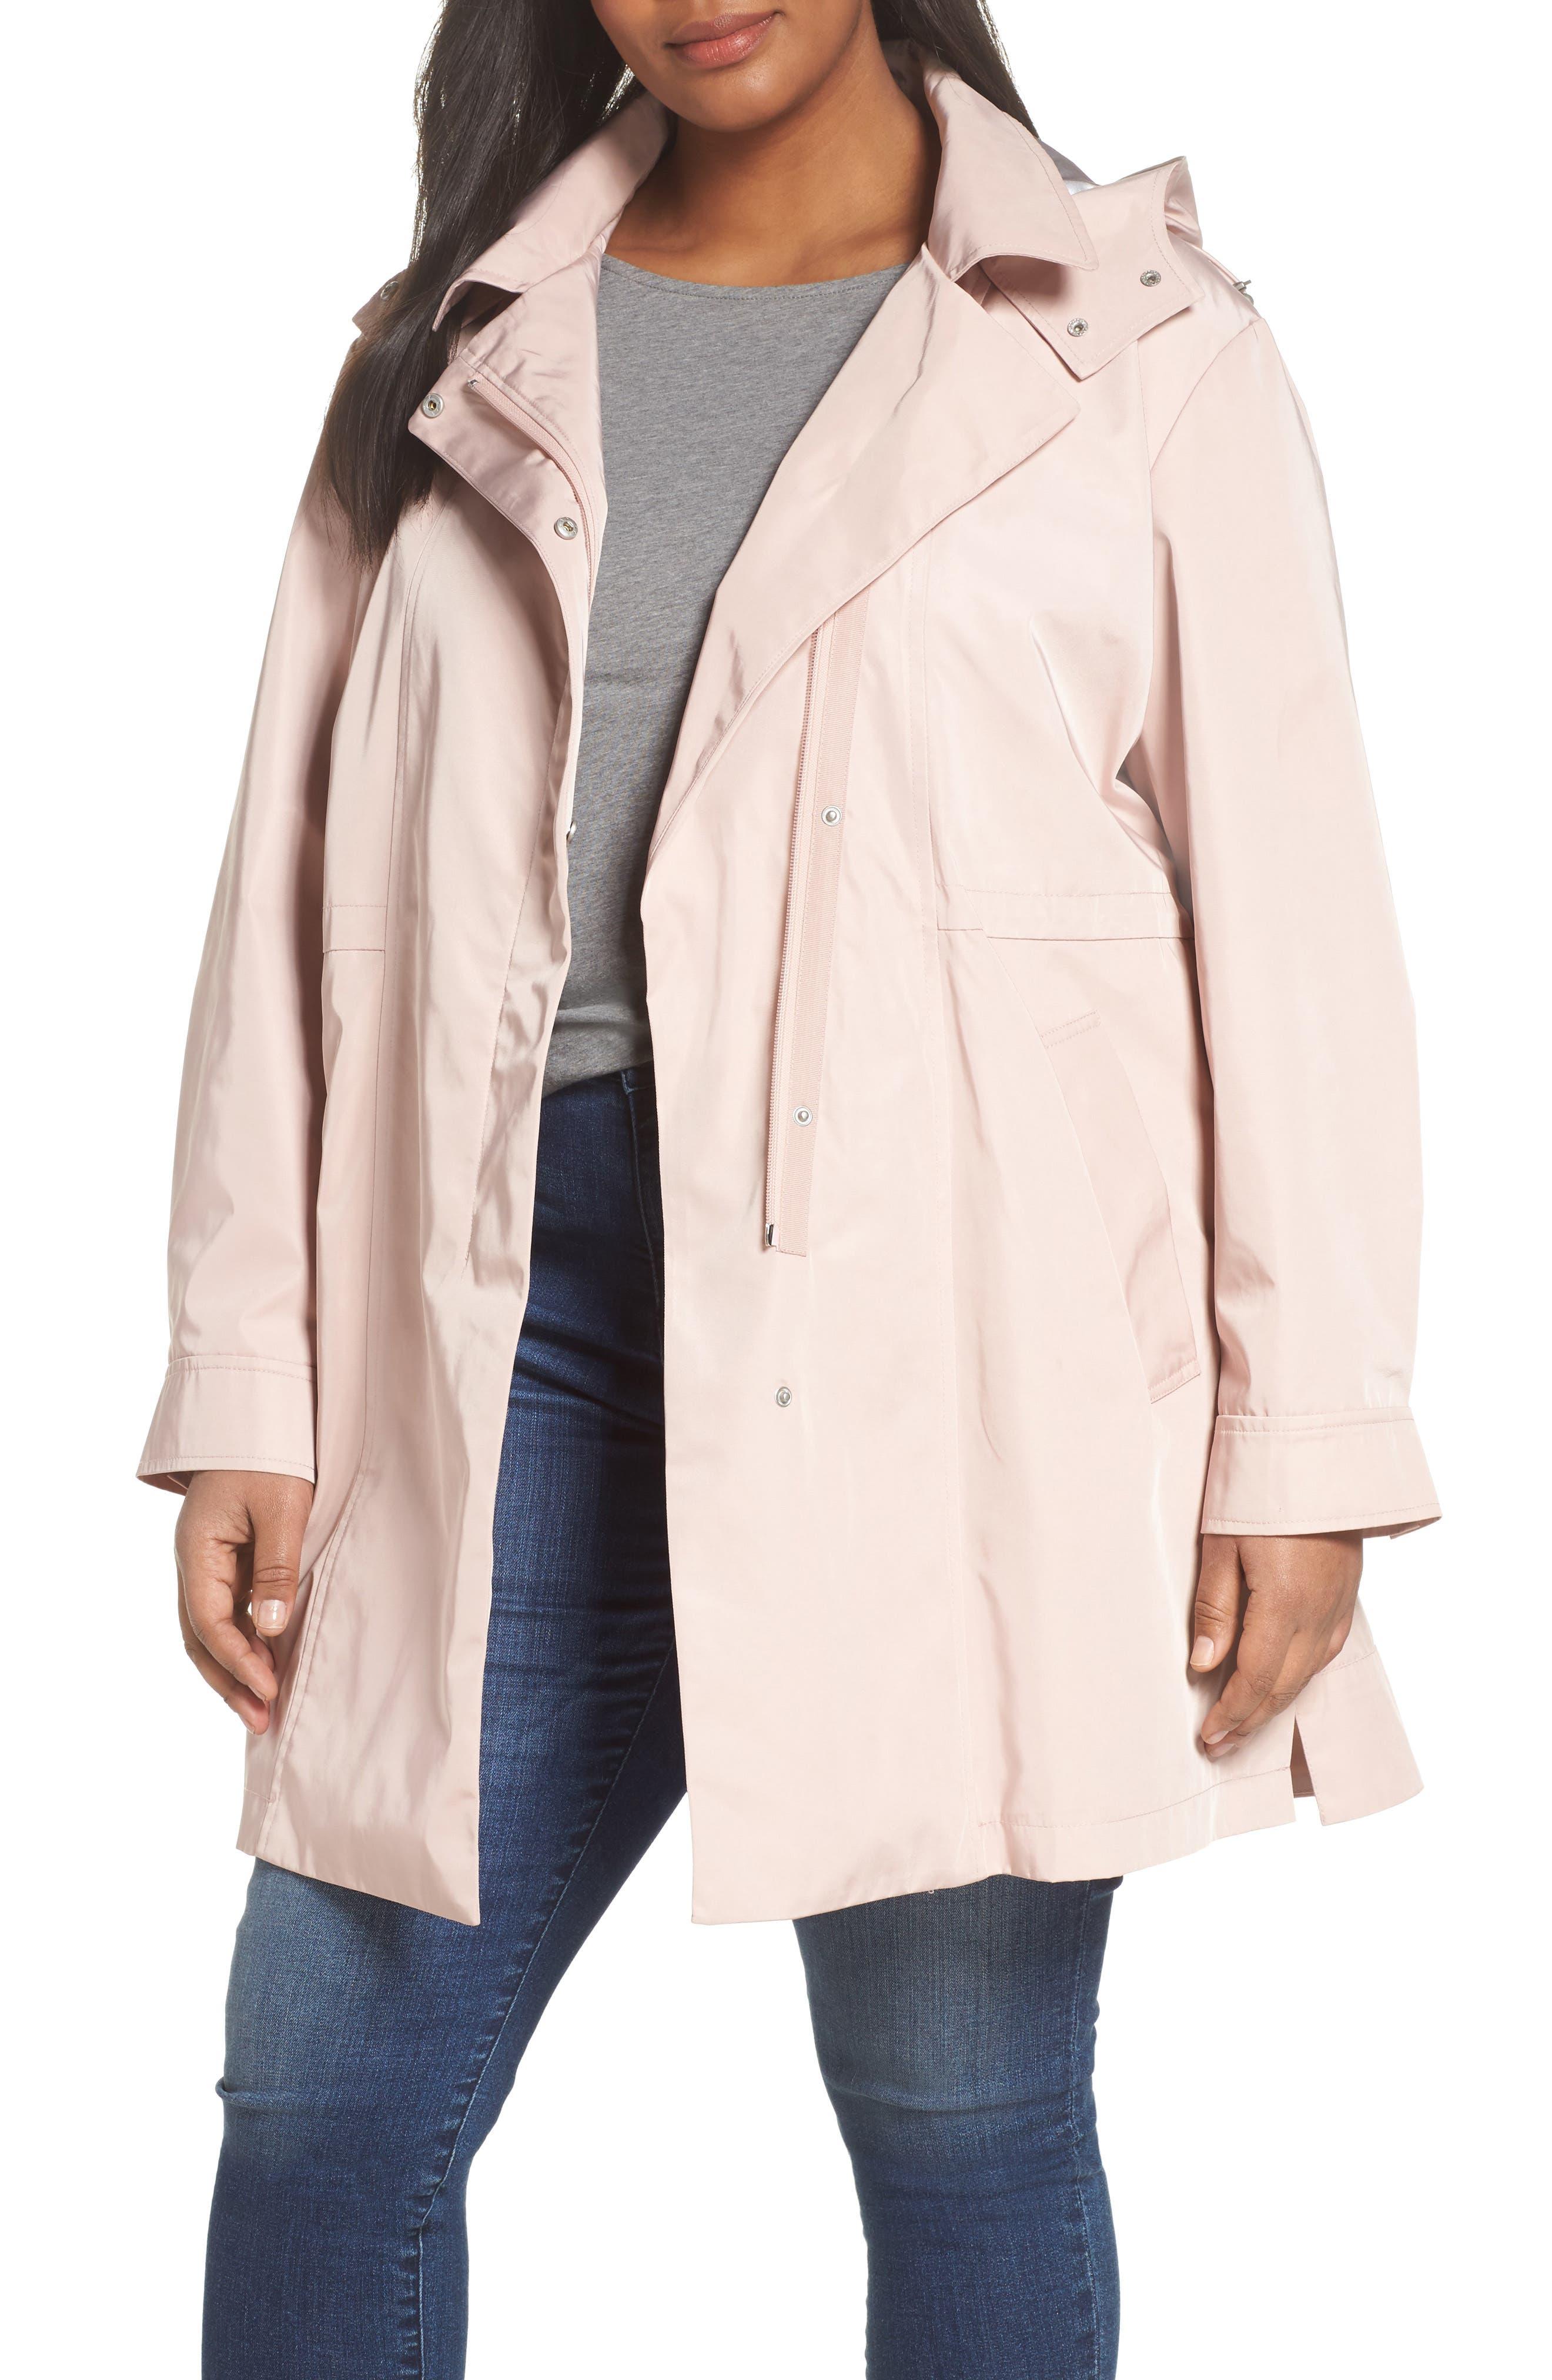 Kristen Blake Tech Hooded Trench Coat (Plus Size)